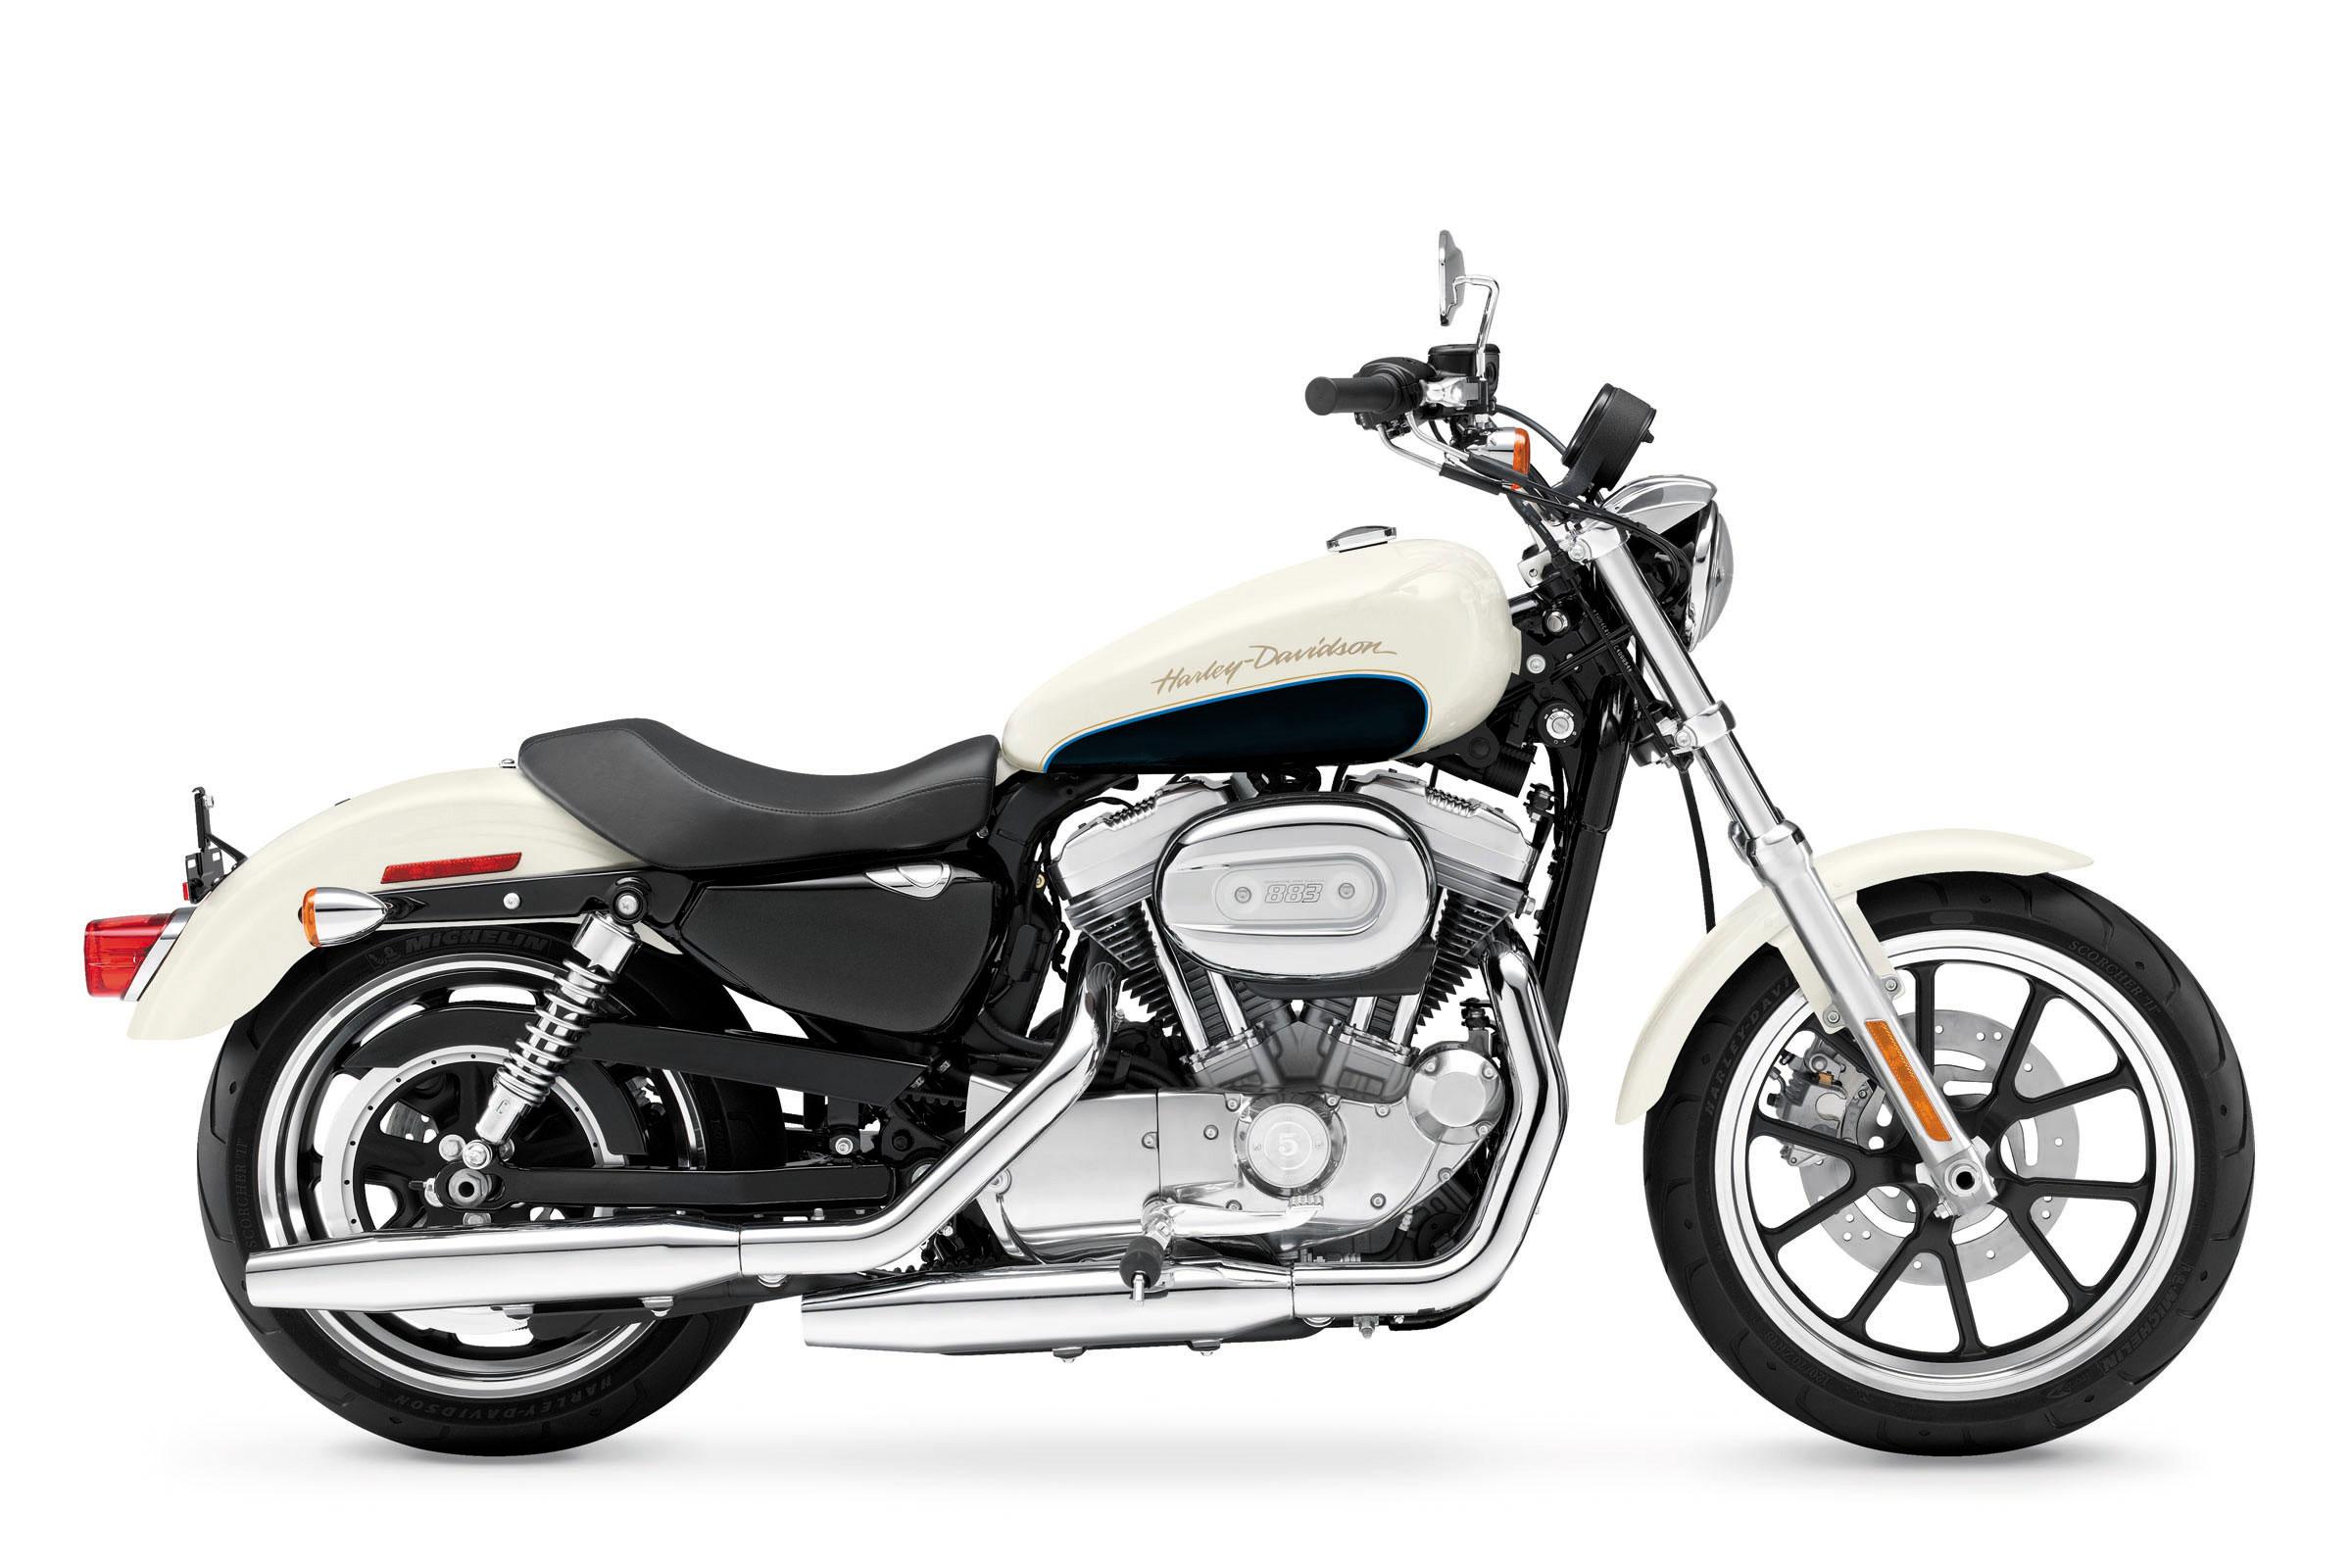 Harley Davidson Sportster   Wallpaper 1024X768 Size Harley Davidson 2400x1600